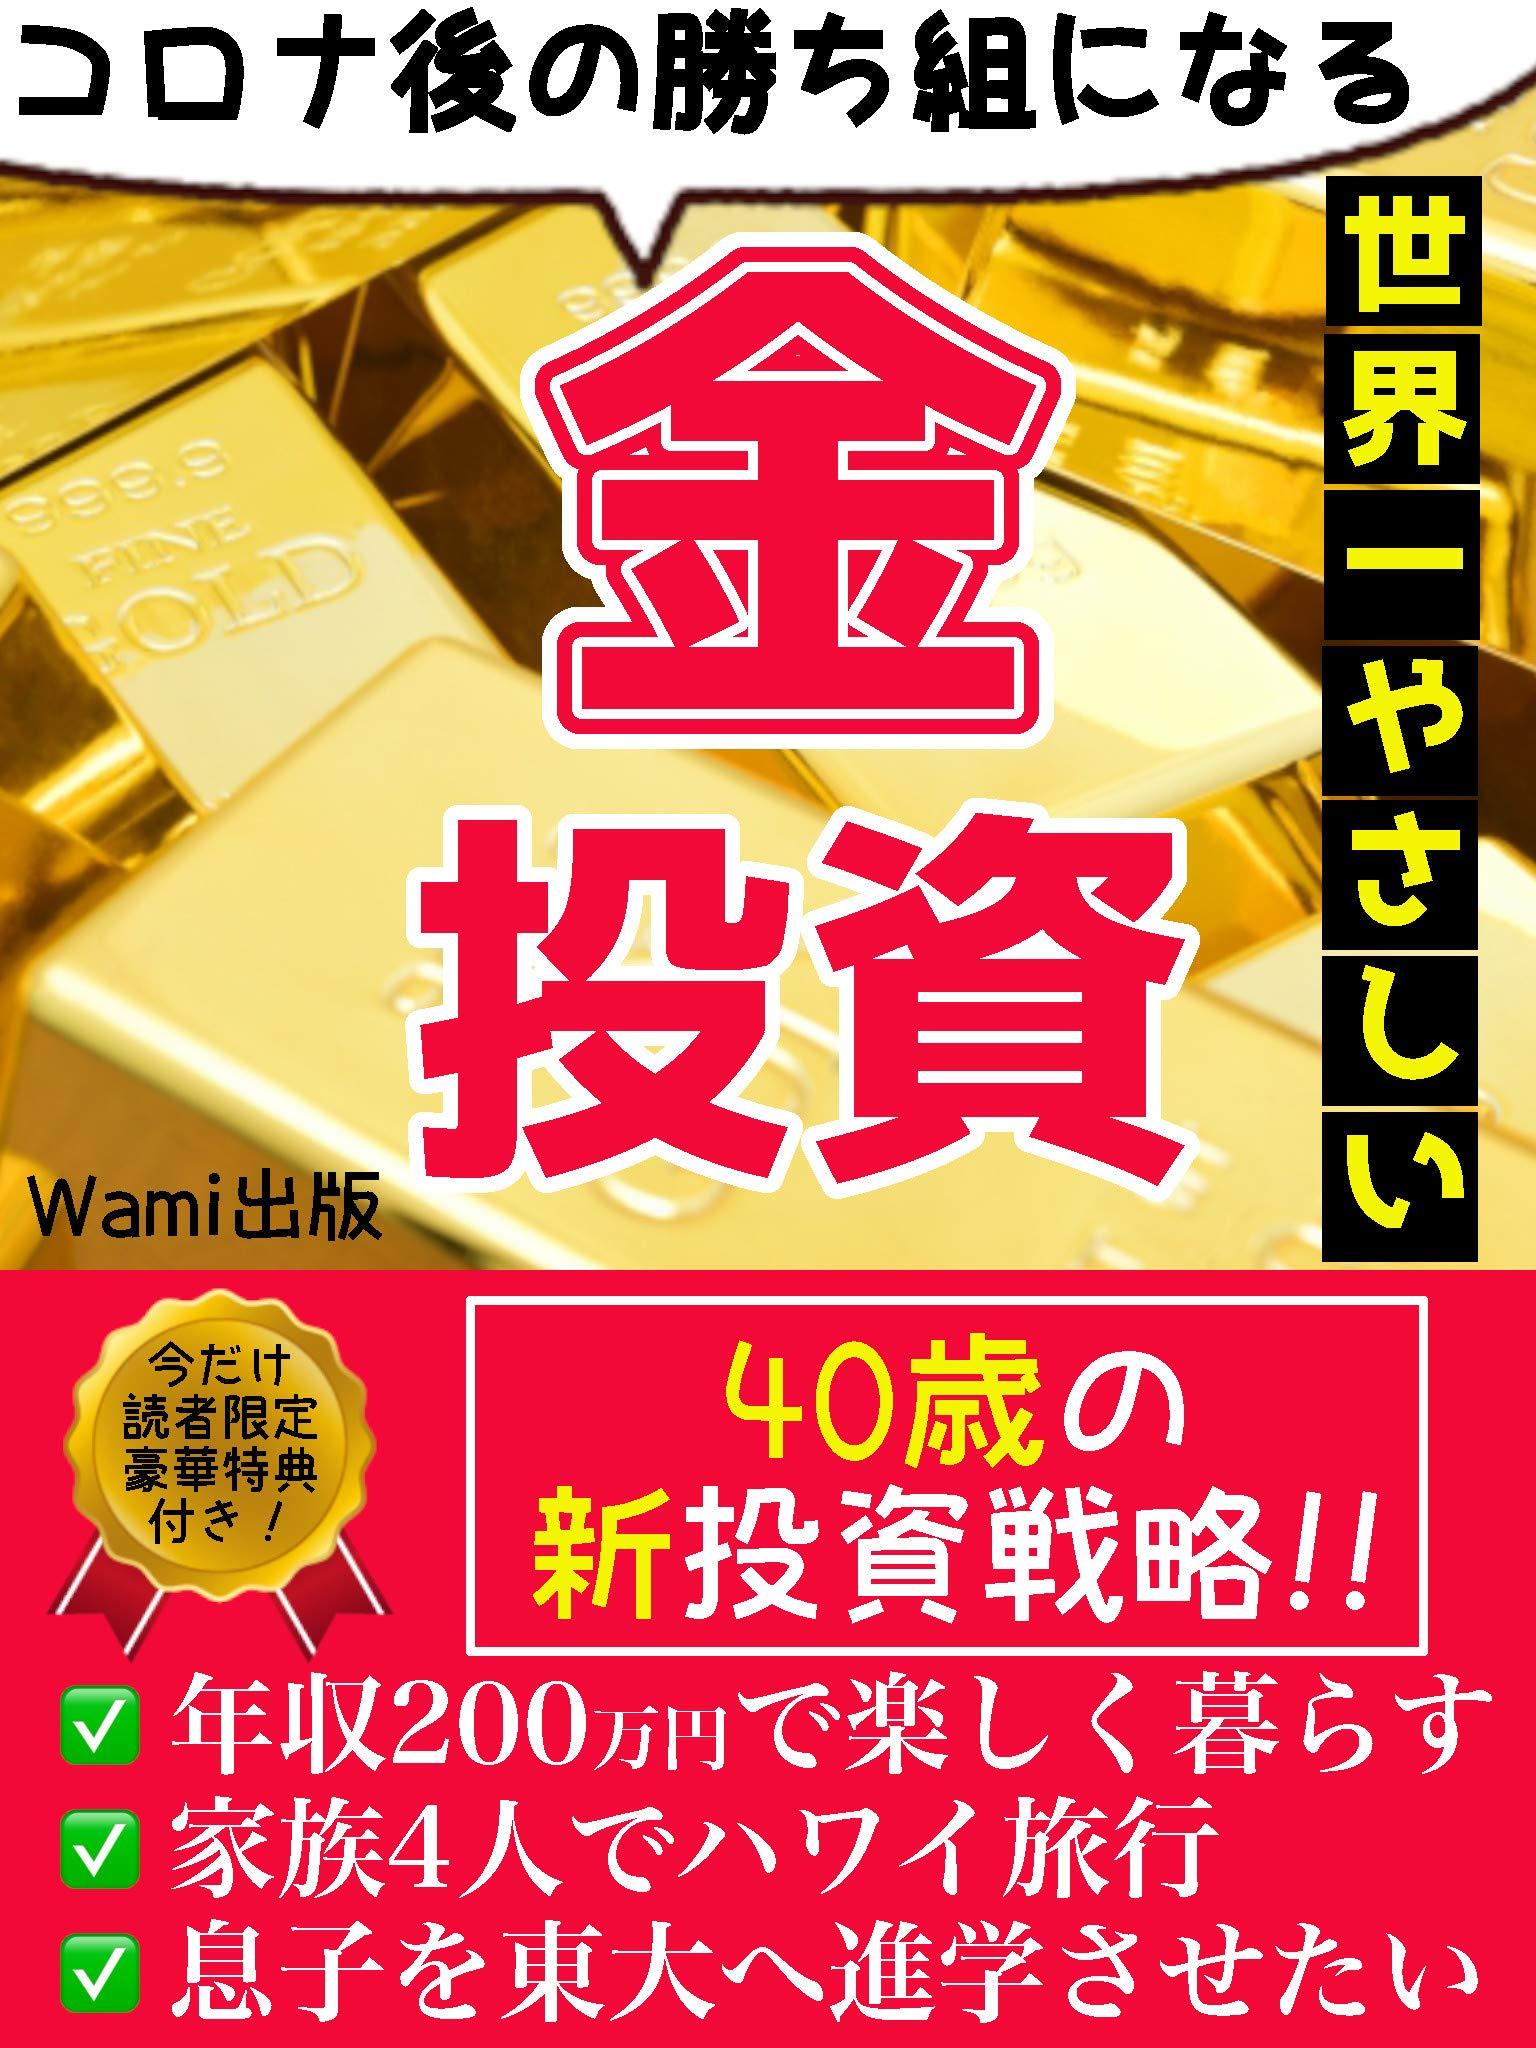 sekaiichiyasasiikintousi: koronagonokachigumininaruyonjyussainosintousisenryaku (Japanese Edition)